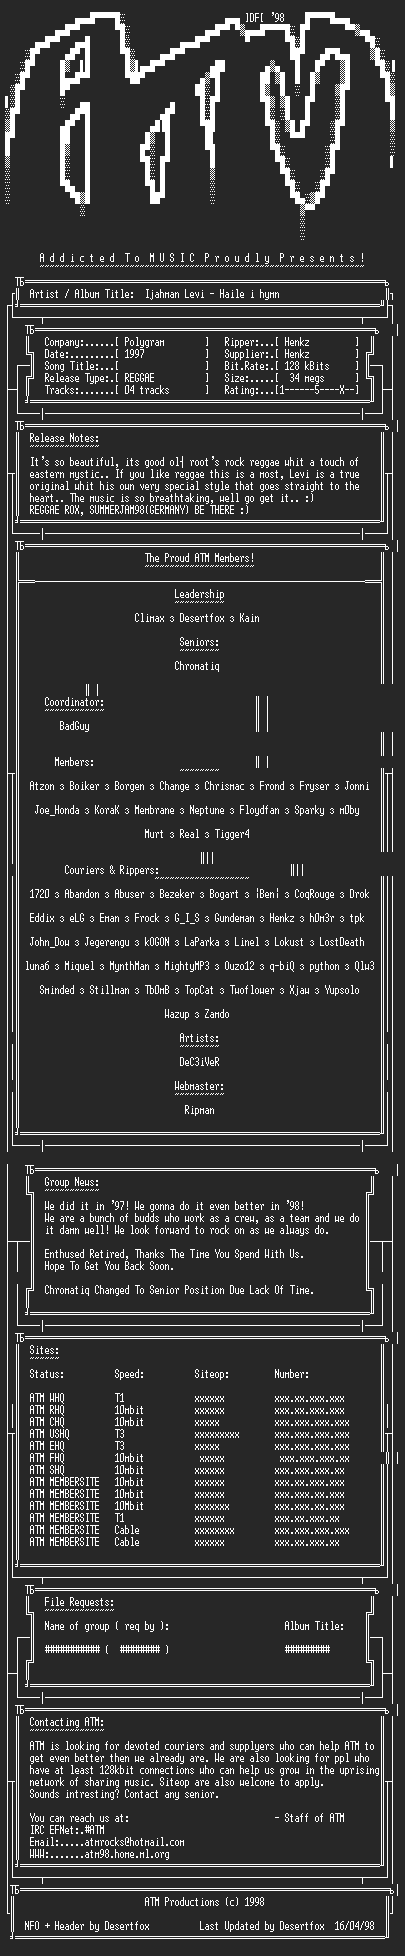 NFO file for Ijahman_Levi-Haile_I_Hymn_(1997)_-_ATM